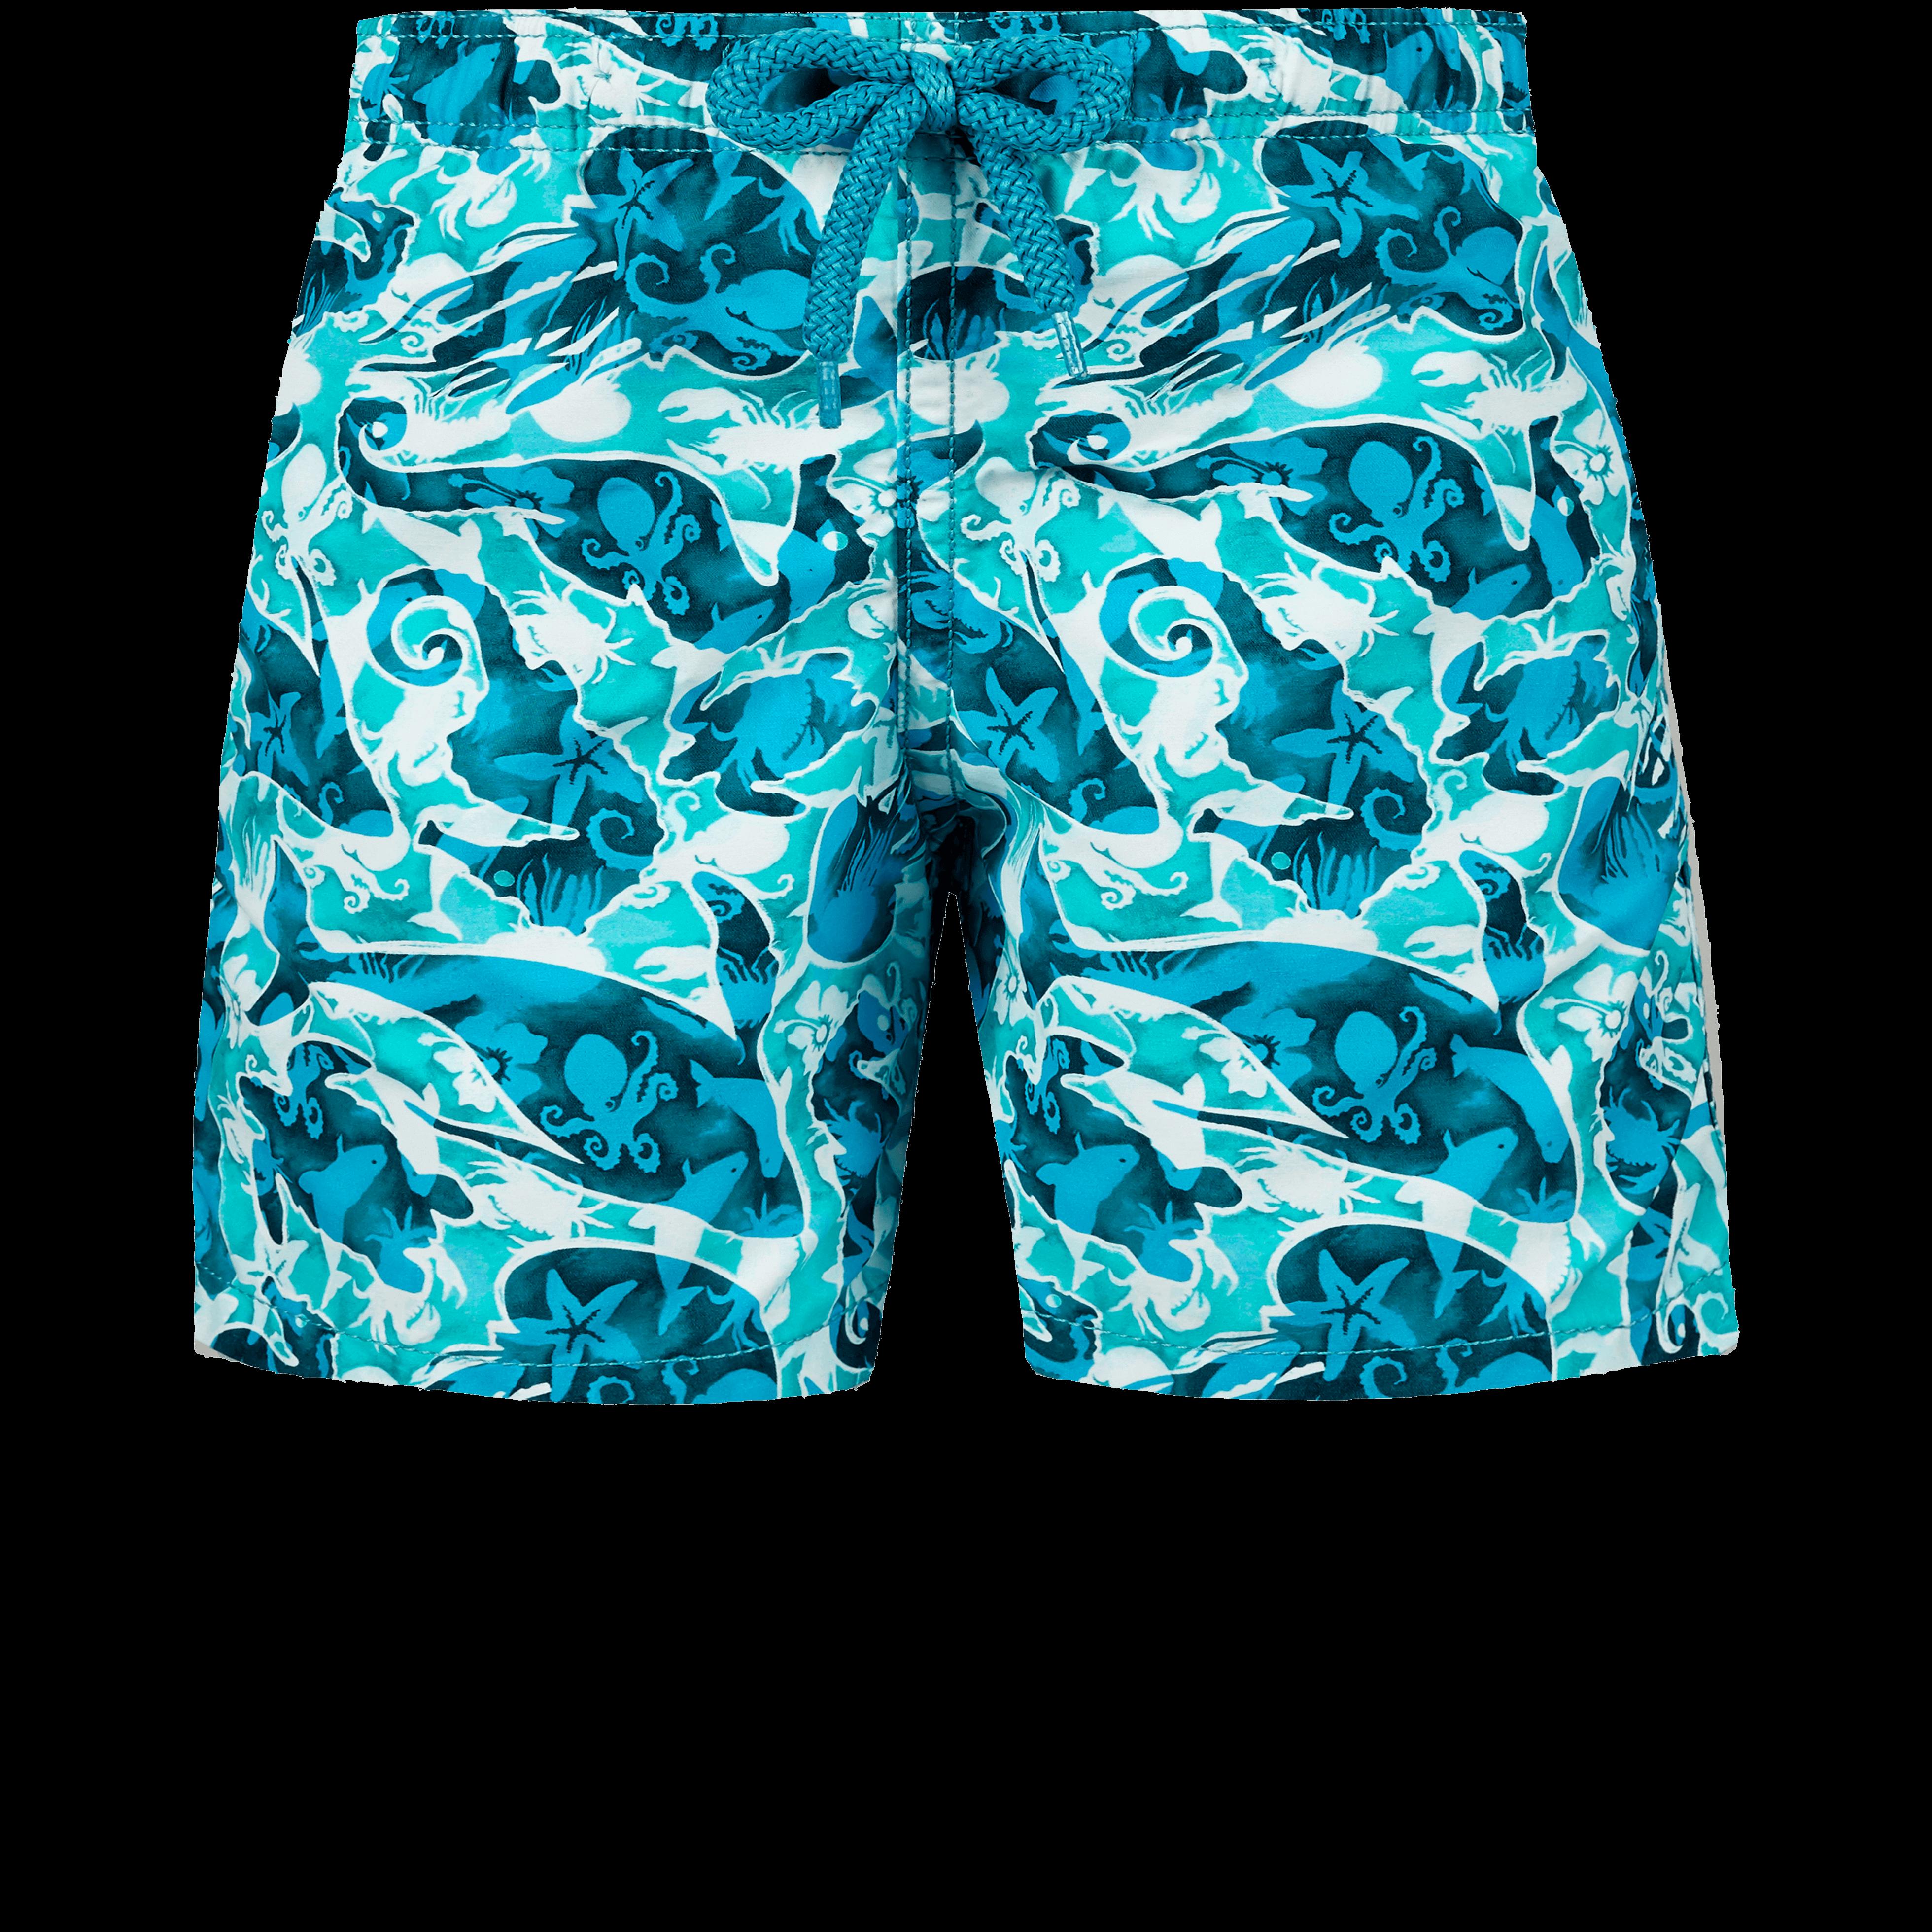 VILEBREQUIN | Boys Swimwear - Boys Swimwear Double Focus - Web Exclusive - SWIMMING TRUNK - JIM - Green - 14 - Vilebrequin | Goxip